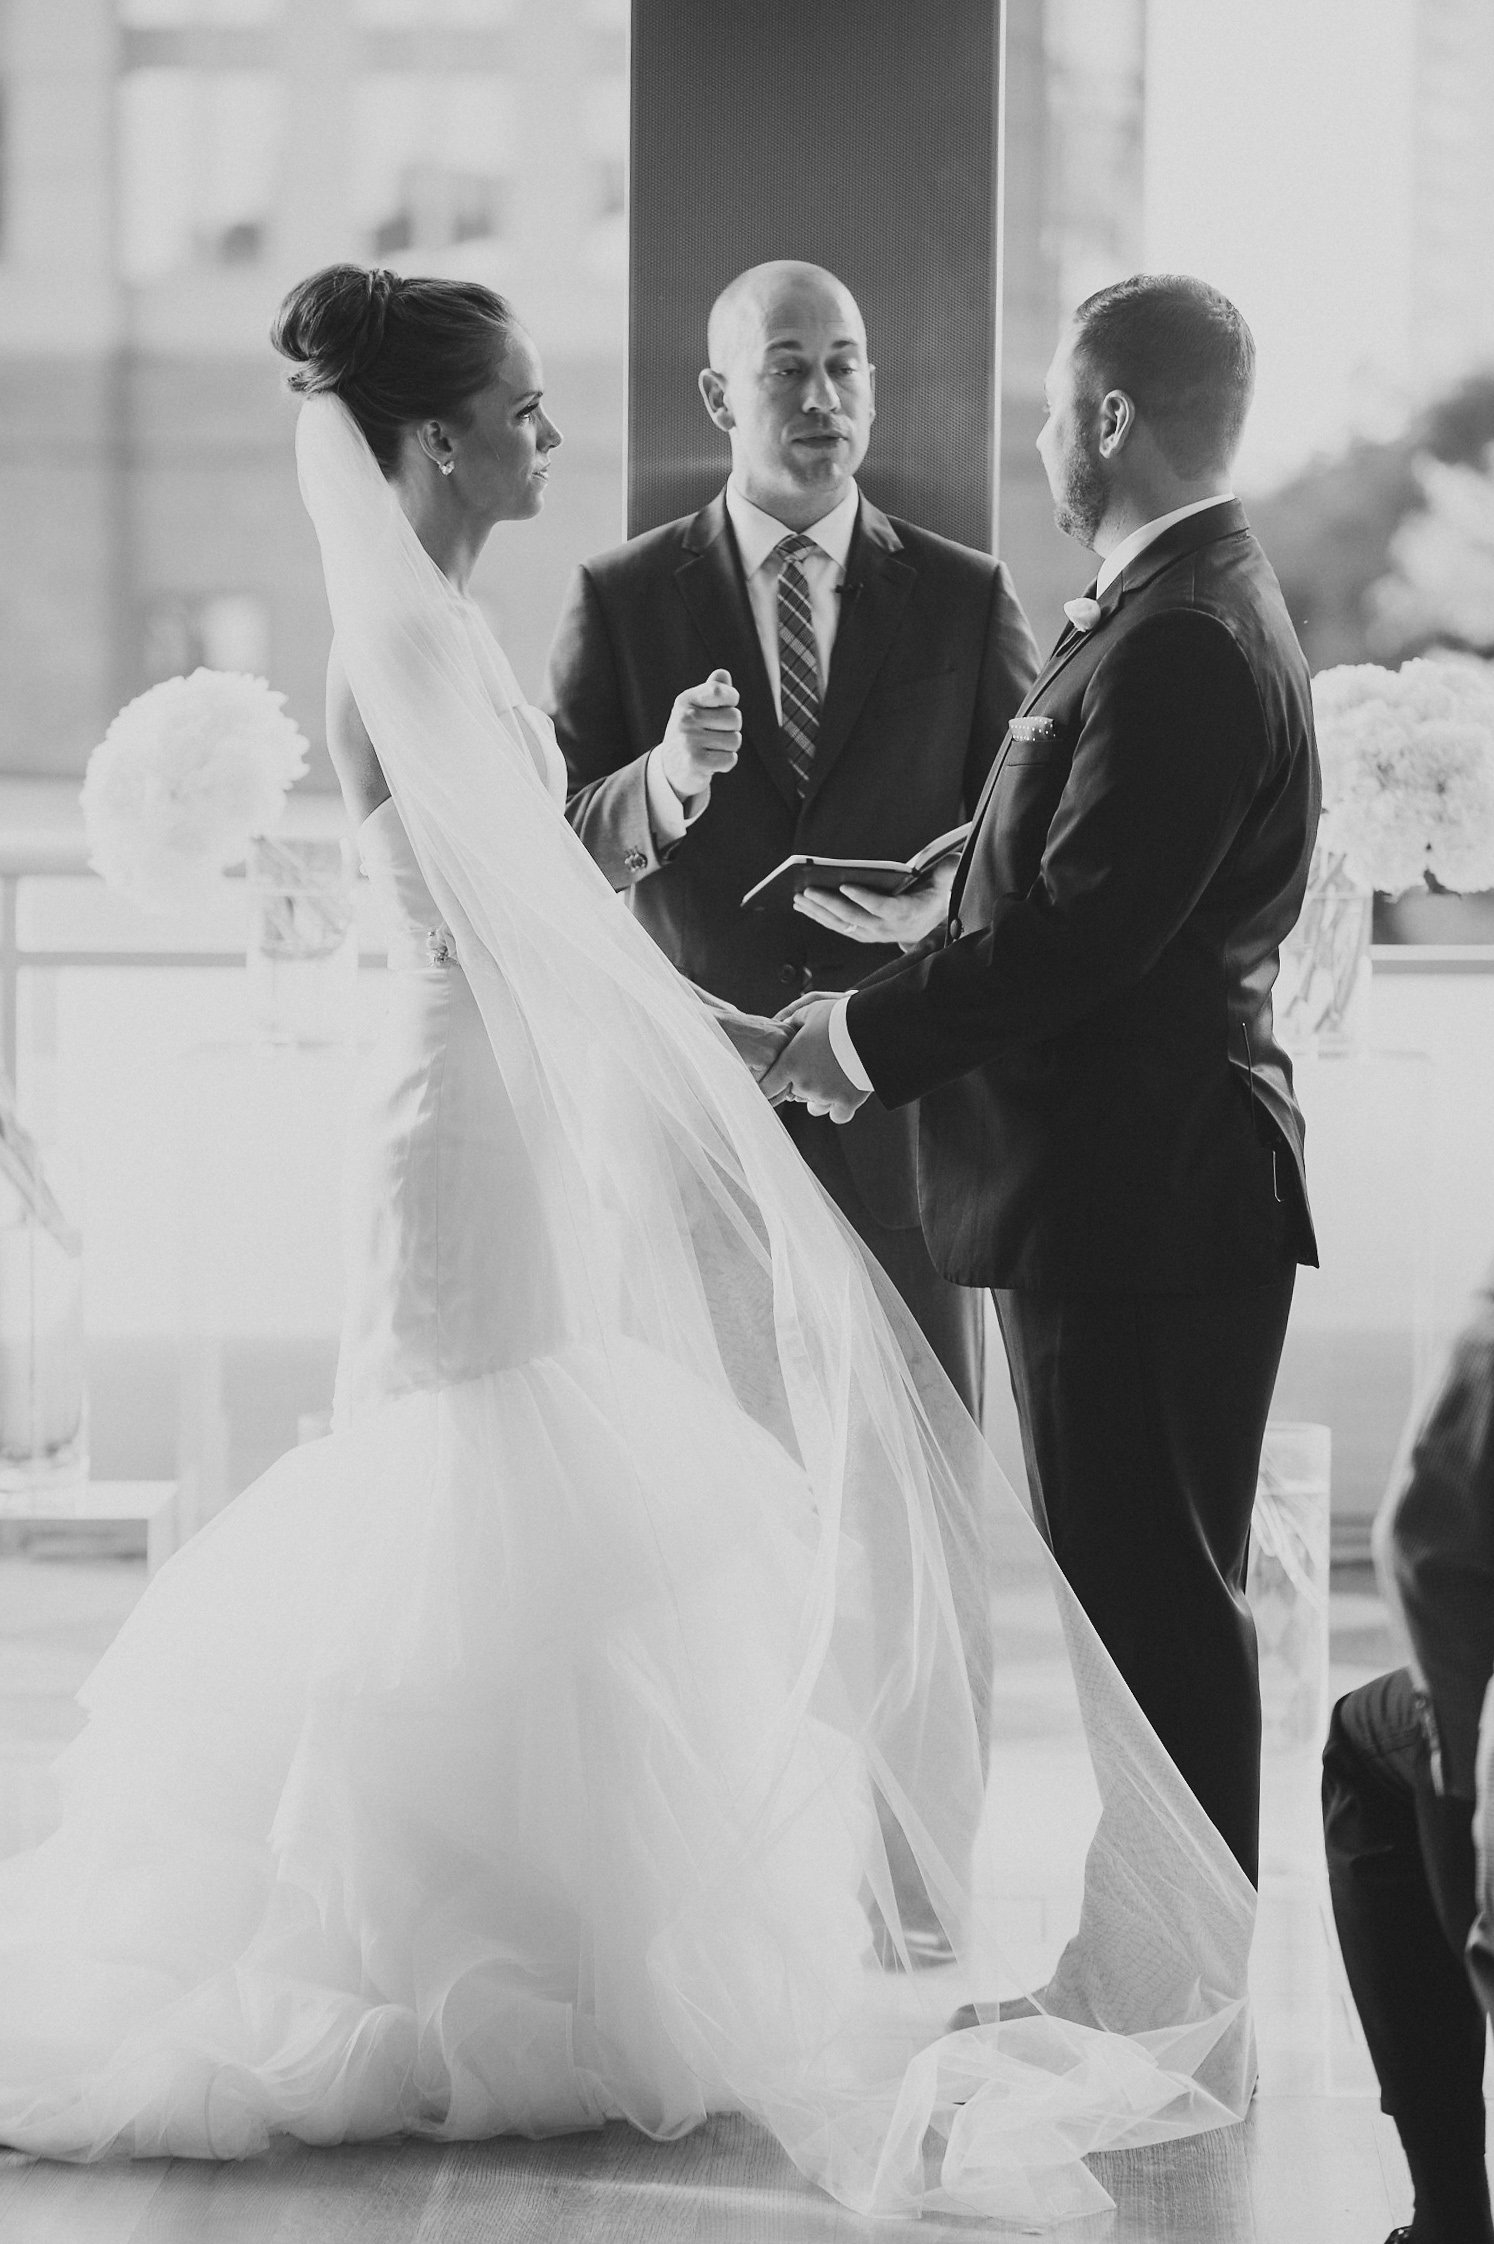 shelby&jordan|smitten&hooked|wedding|ceremony-098.jpg